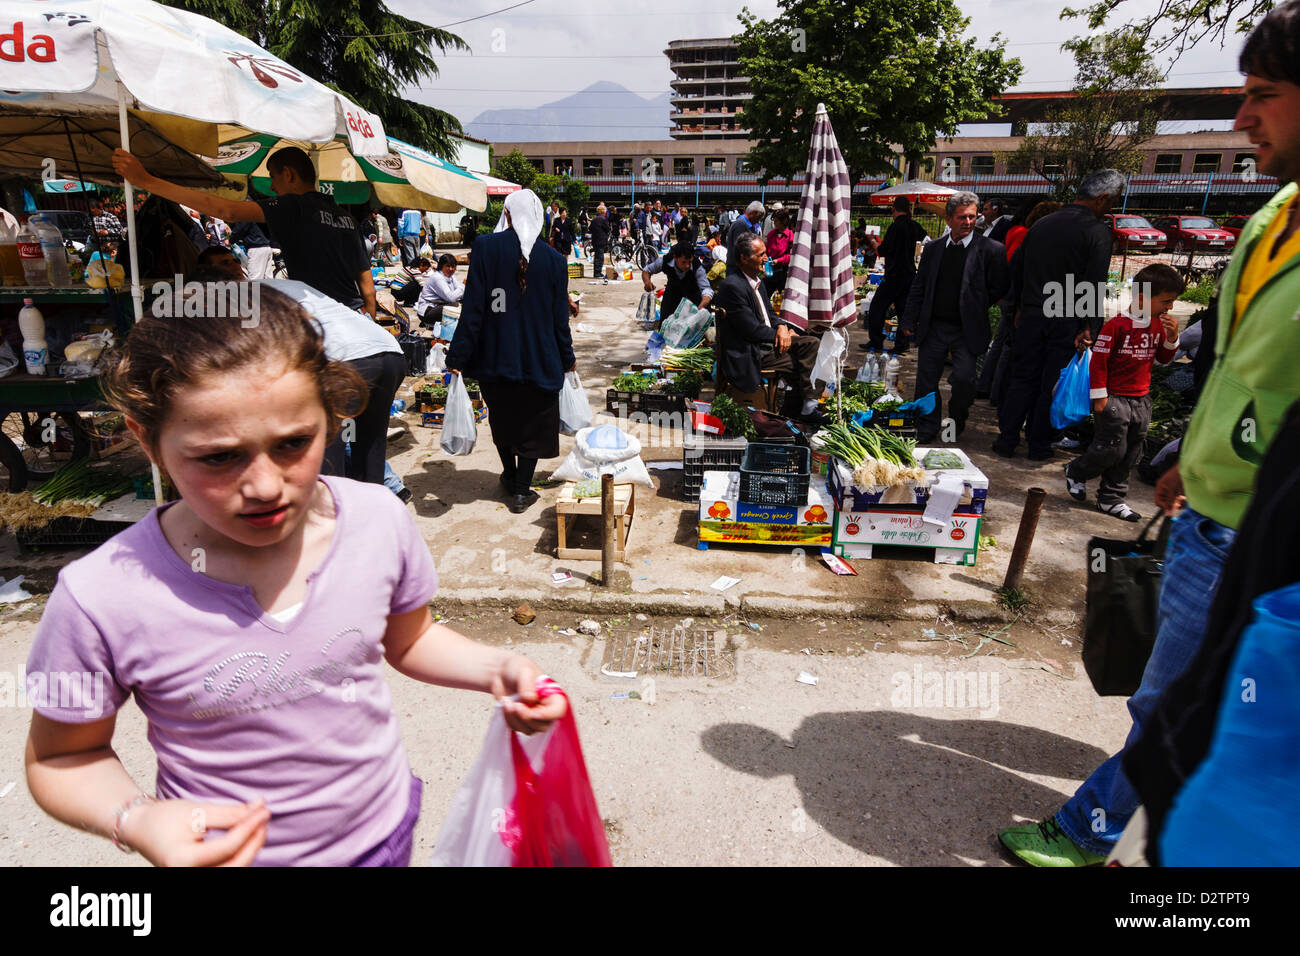 Pazari i ri, Central Market in Tirana, Albania - Stock Image